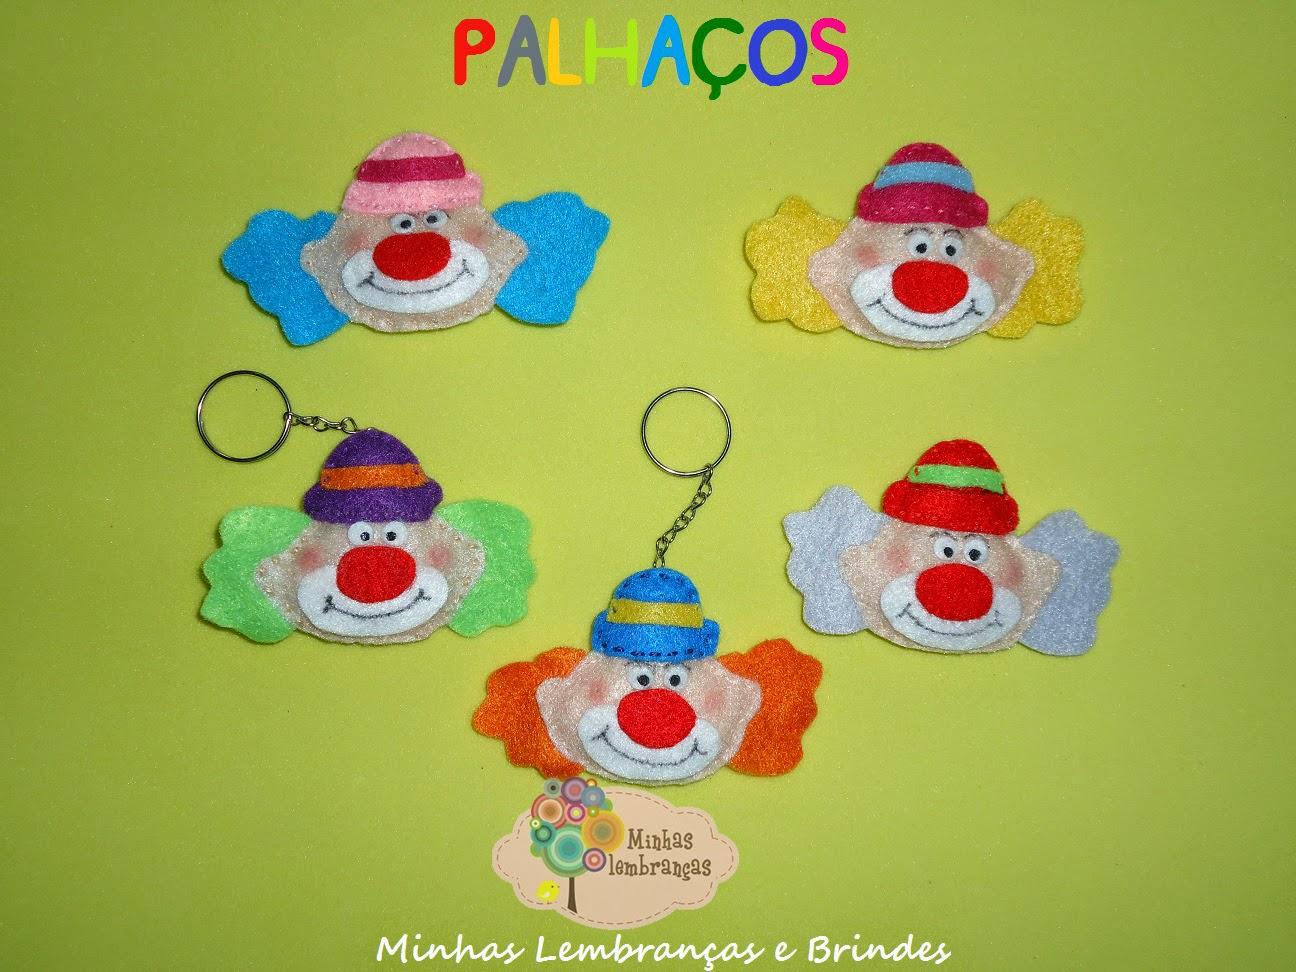 http://minhaslembrancasebrindes.blogspot.com.br/2014/11/palhacos-coloridos.html